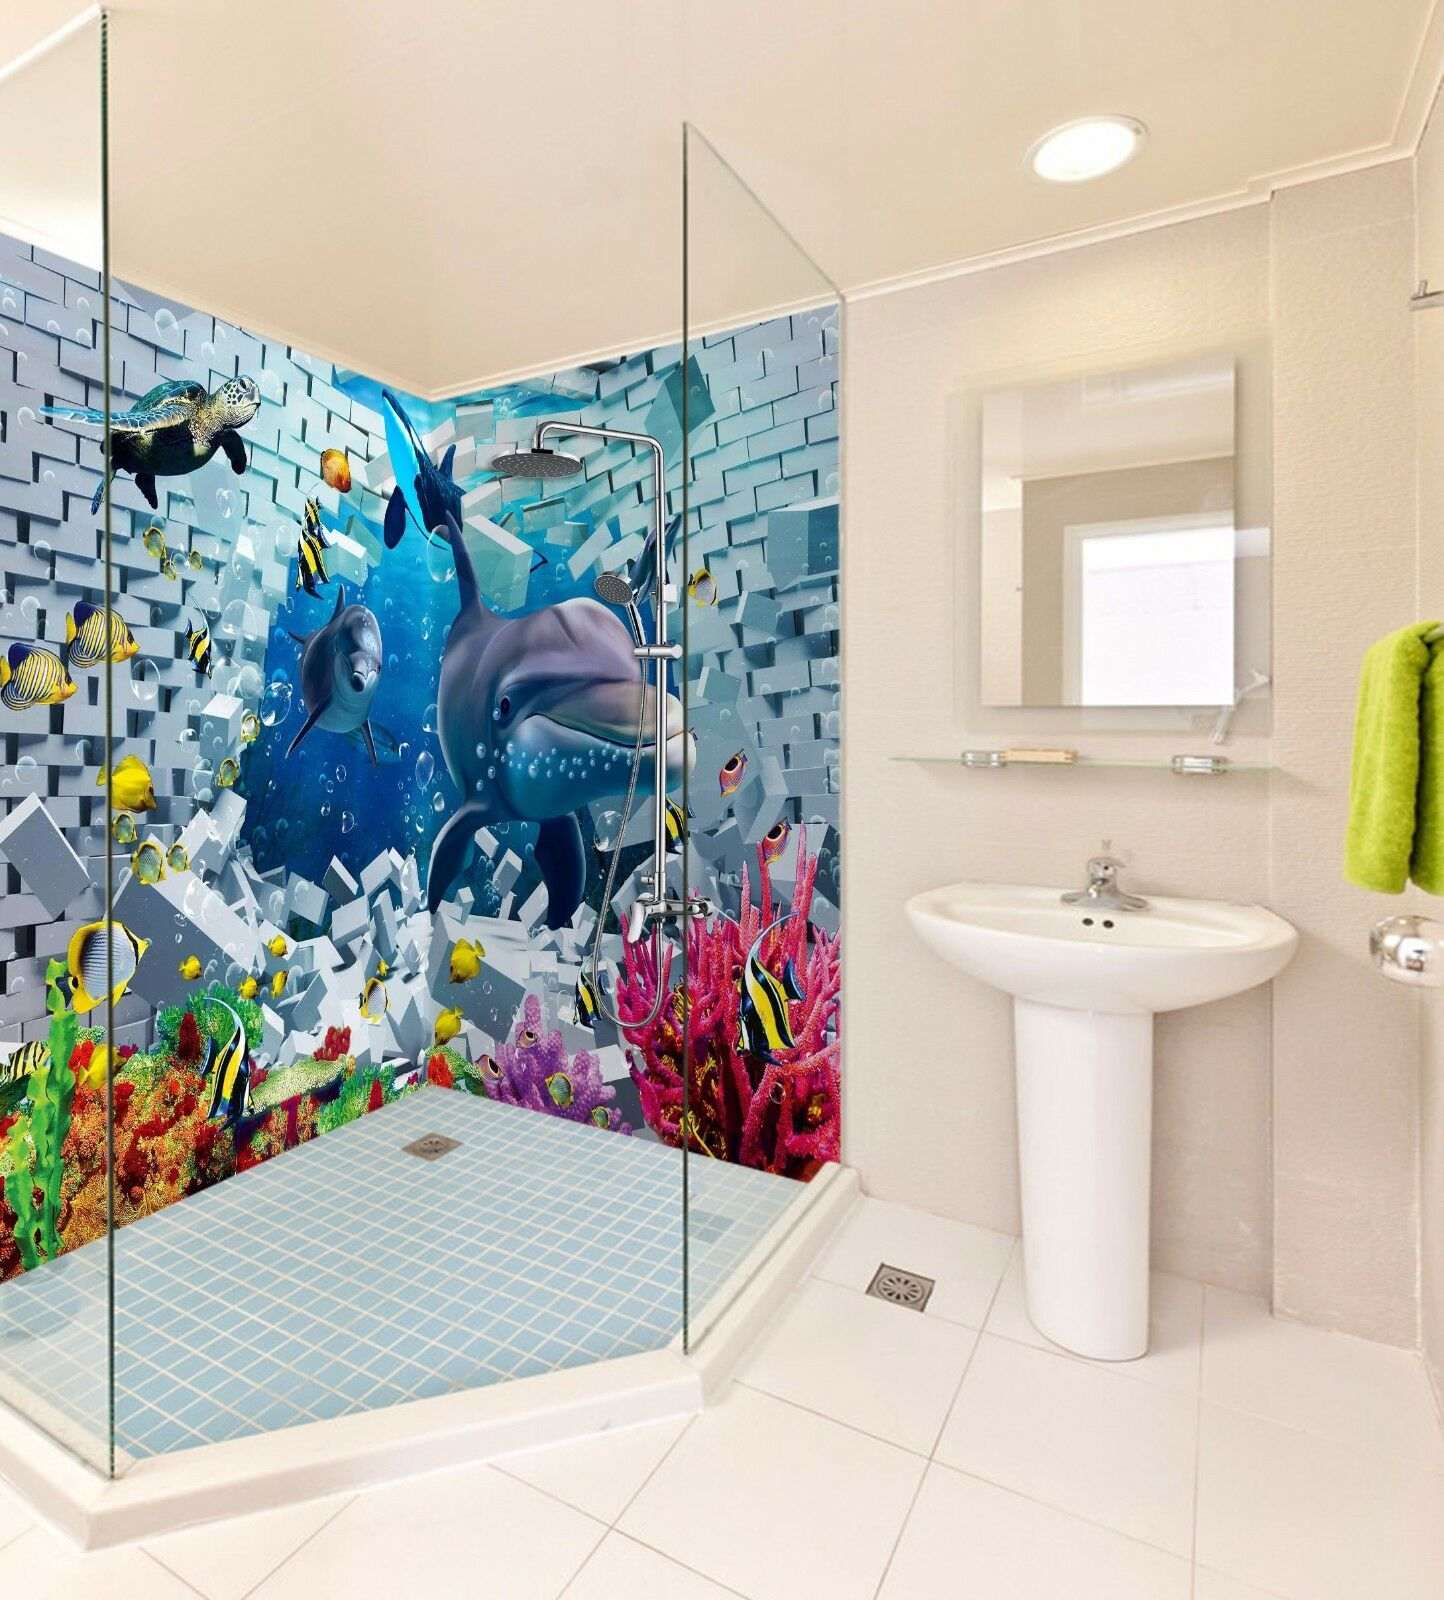 3D Smiling Dolphin 7160 WallPaper Bathroom Print Decal Wall Deco AJ WALLPAPER AU